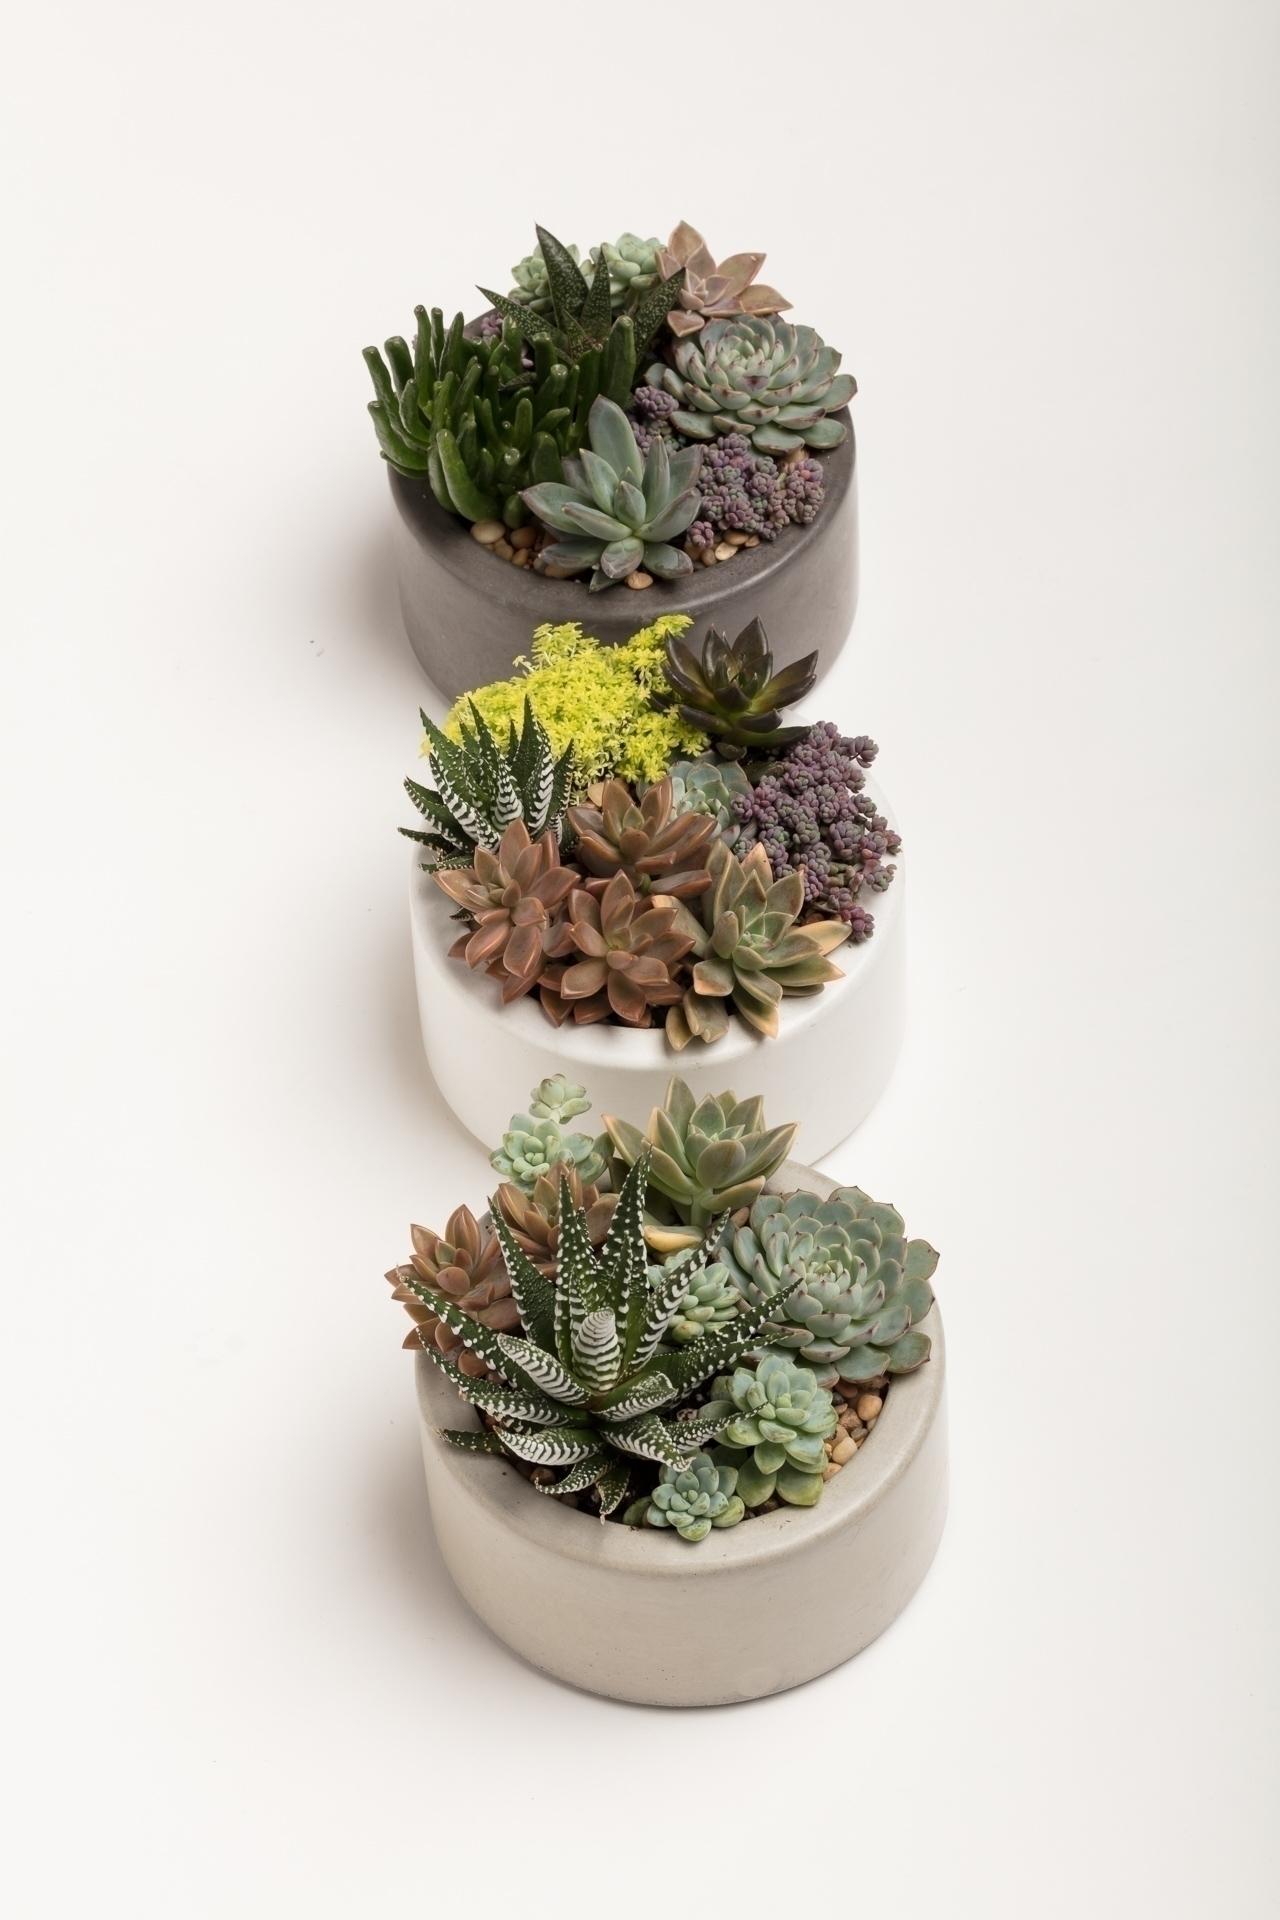 Handmade Concrete Planters 6 3  - opusconcrete | ello